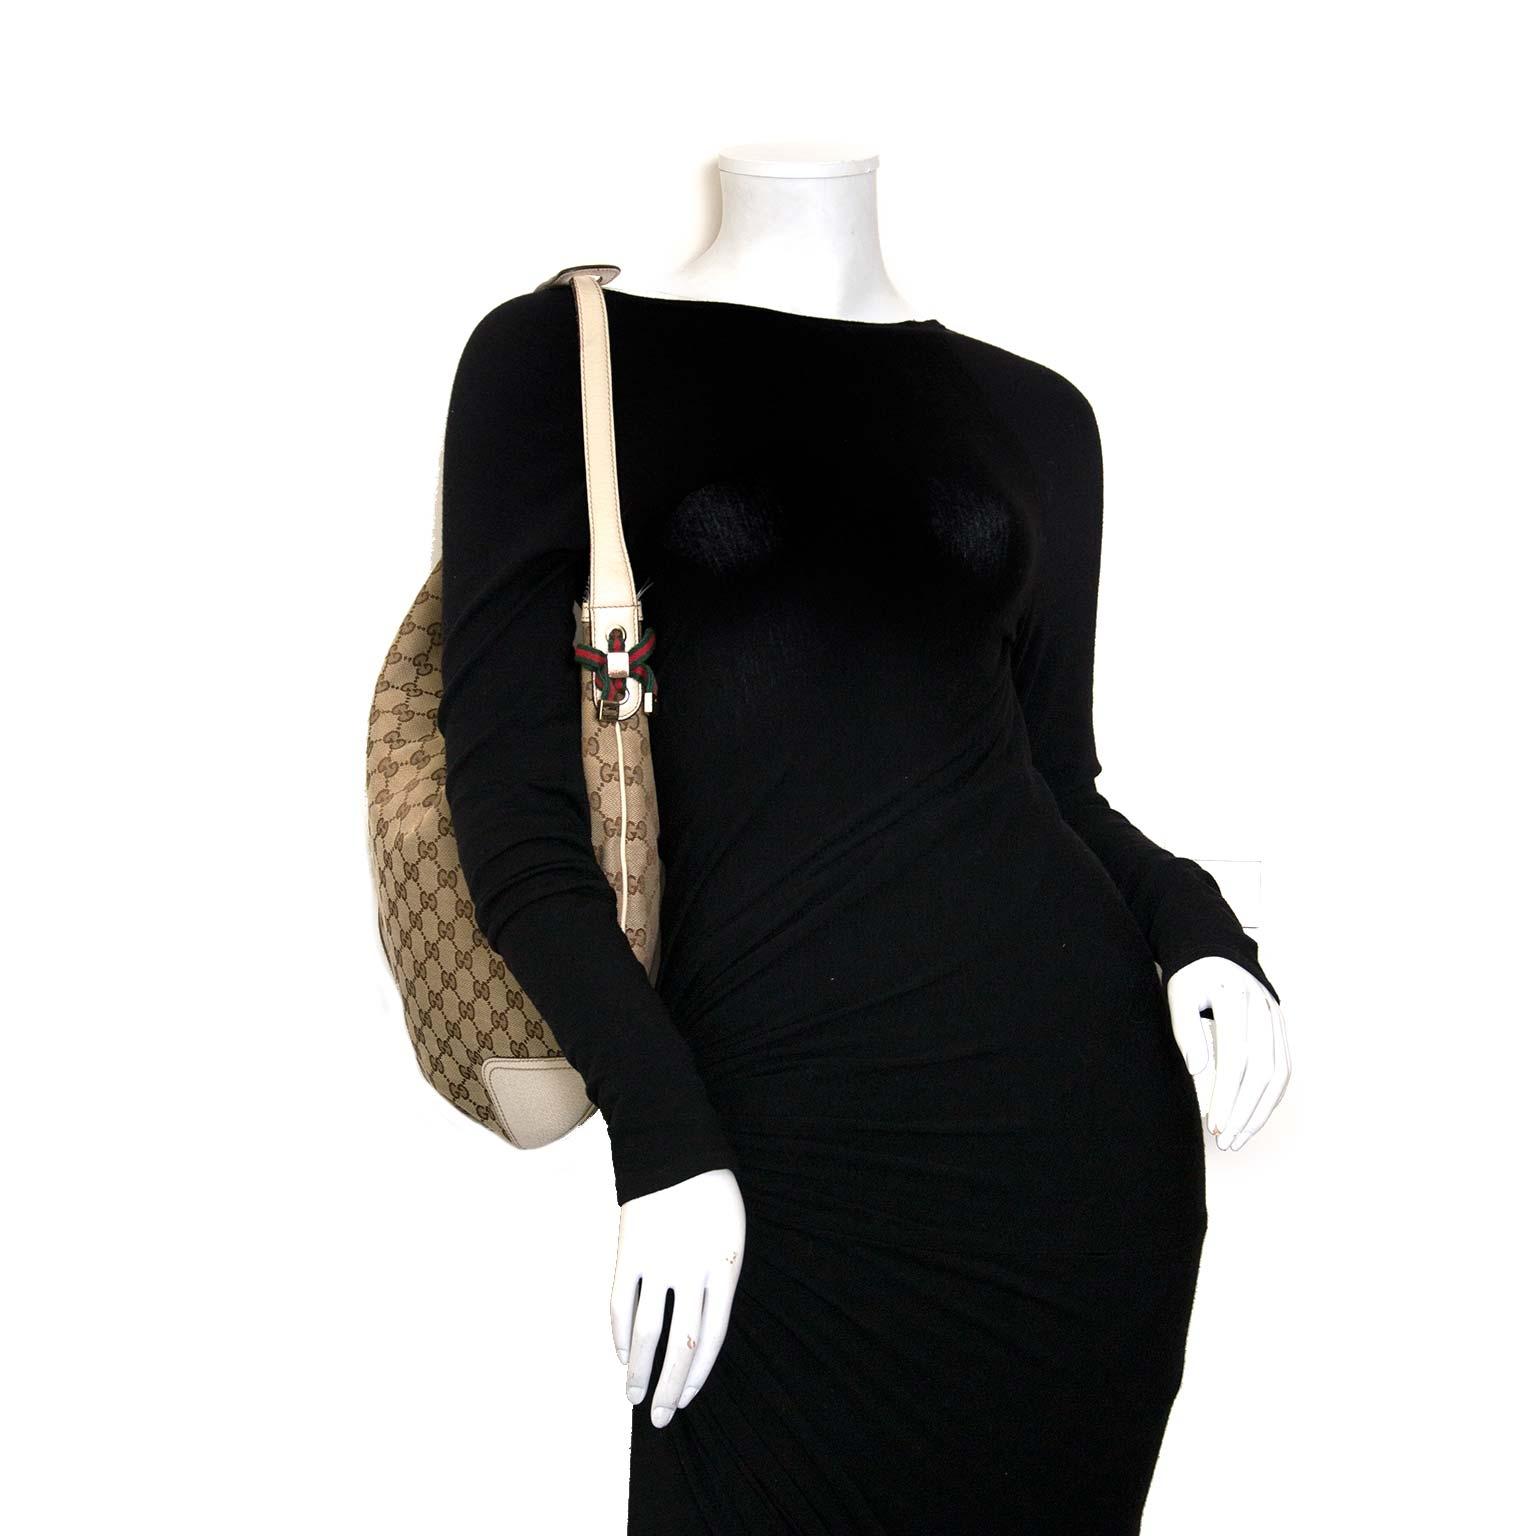 Koop gucci princy monogram tassen bij labellov vintage mode webshop